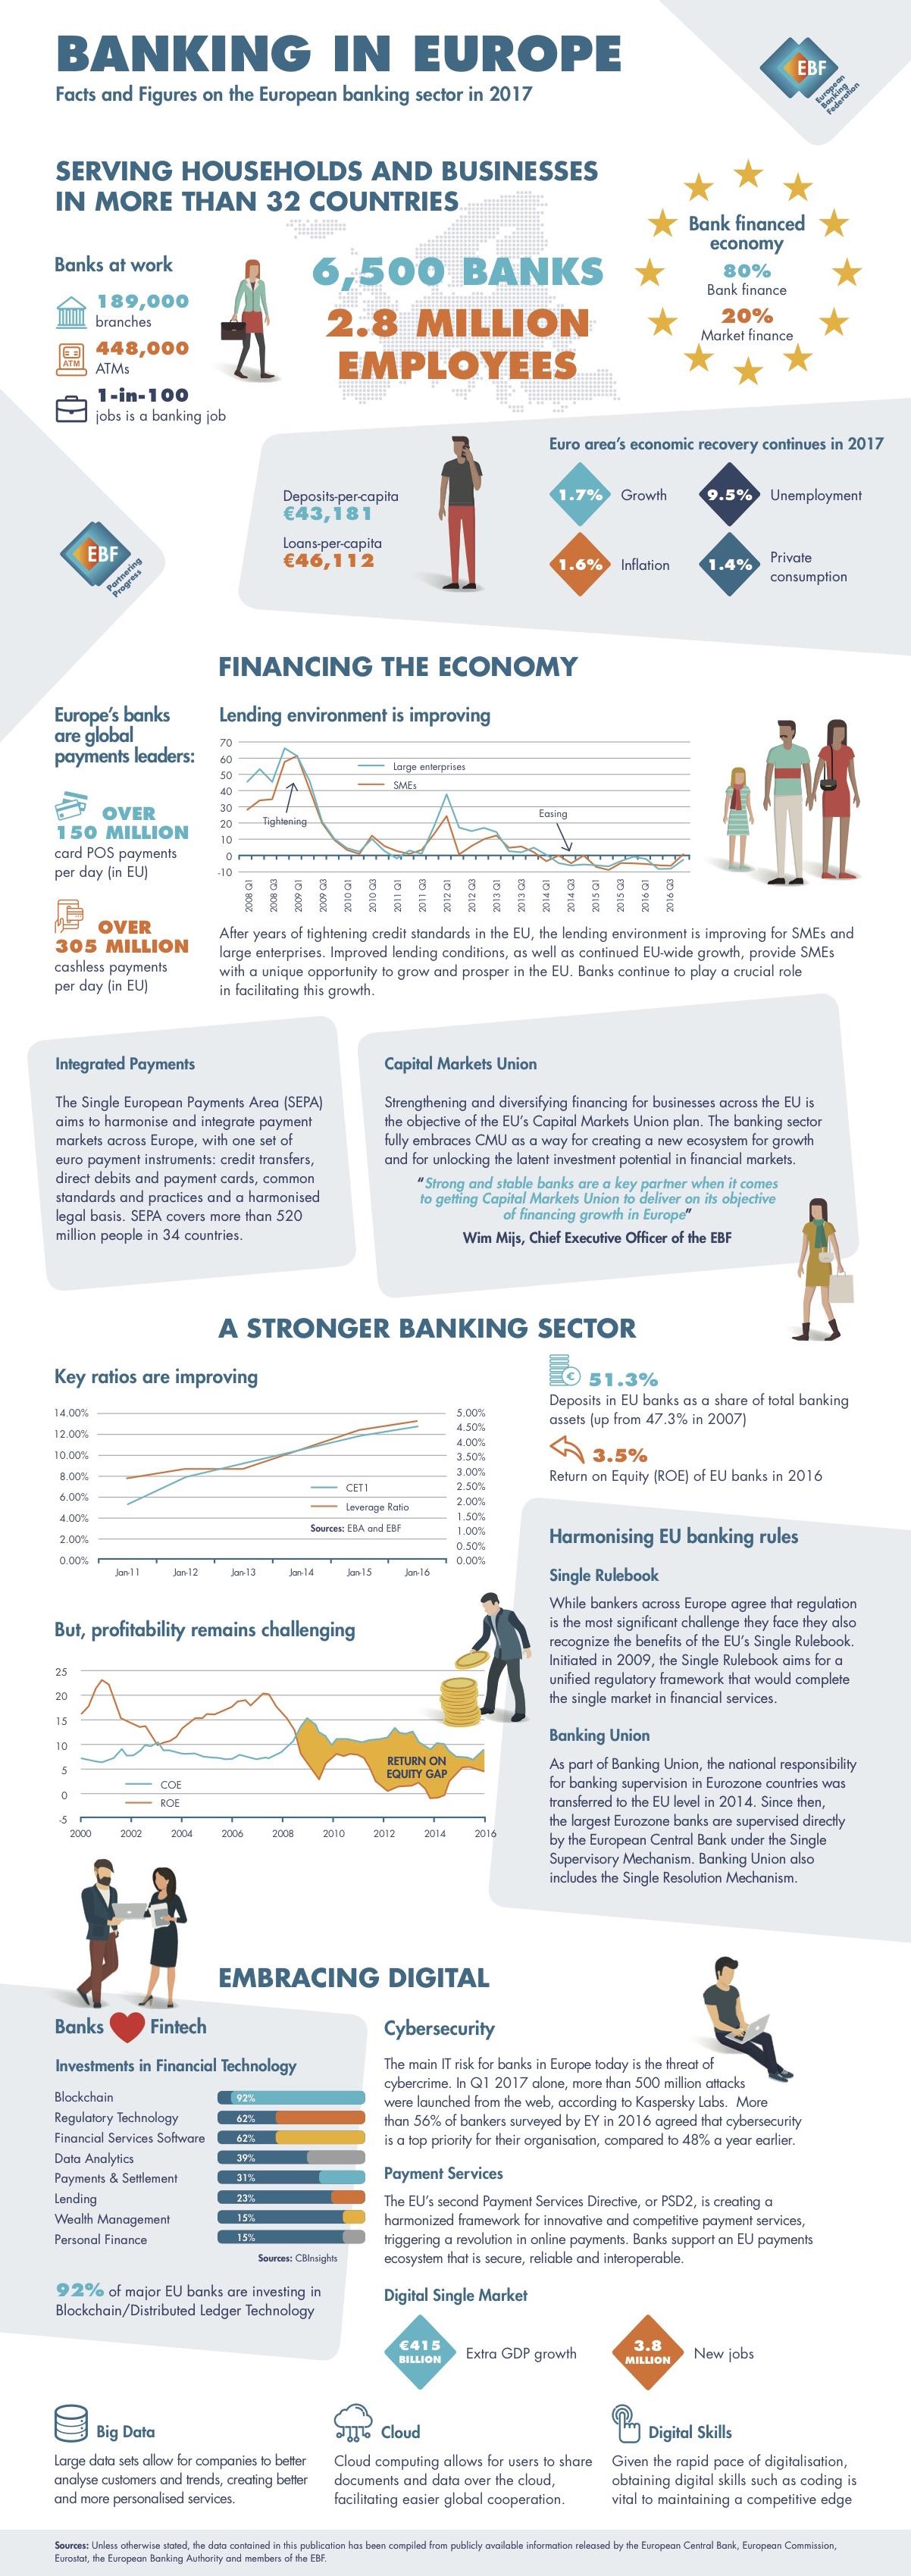 Banking in europe ebf infographic 2017g malvernweather Images